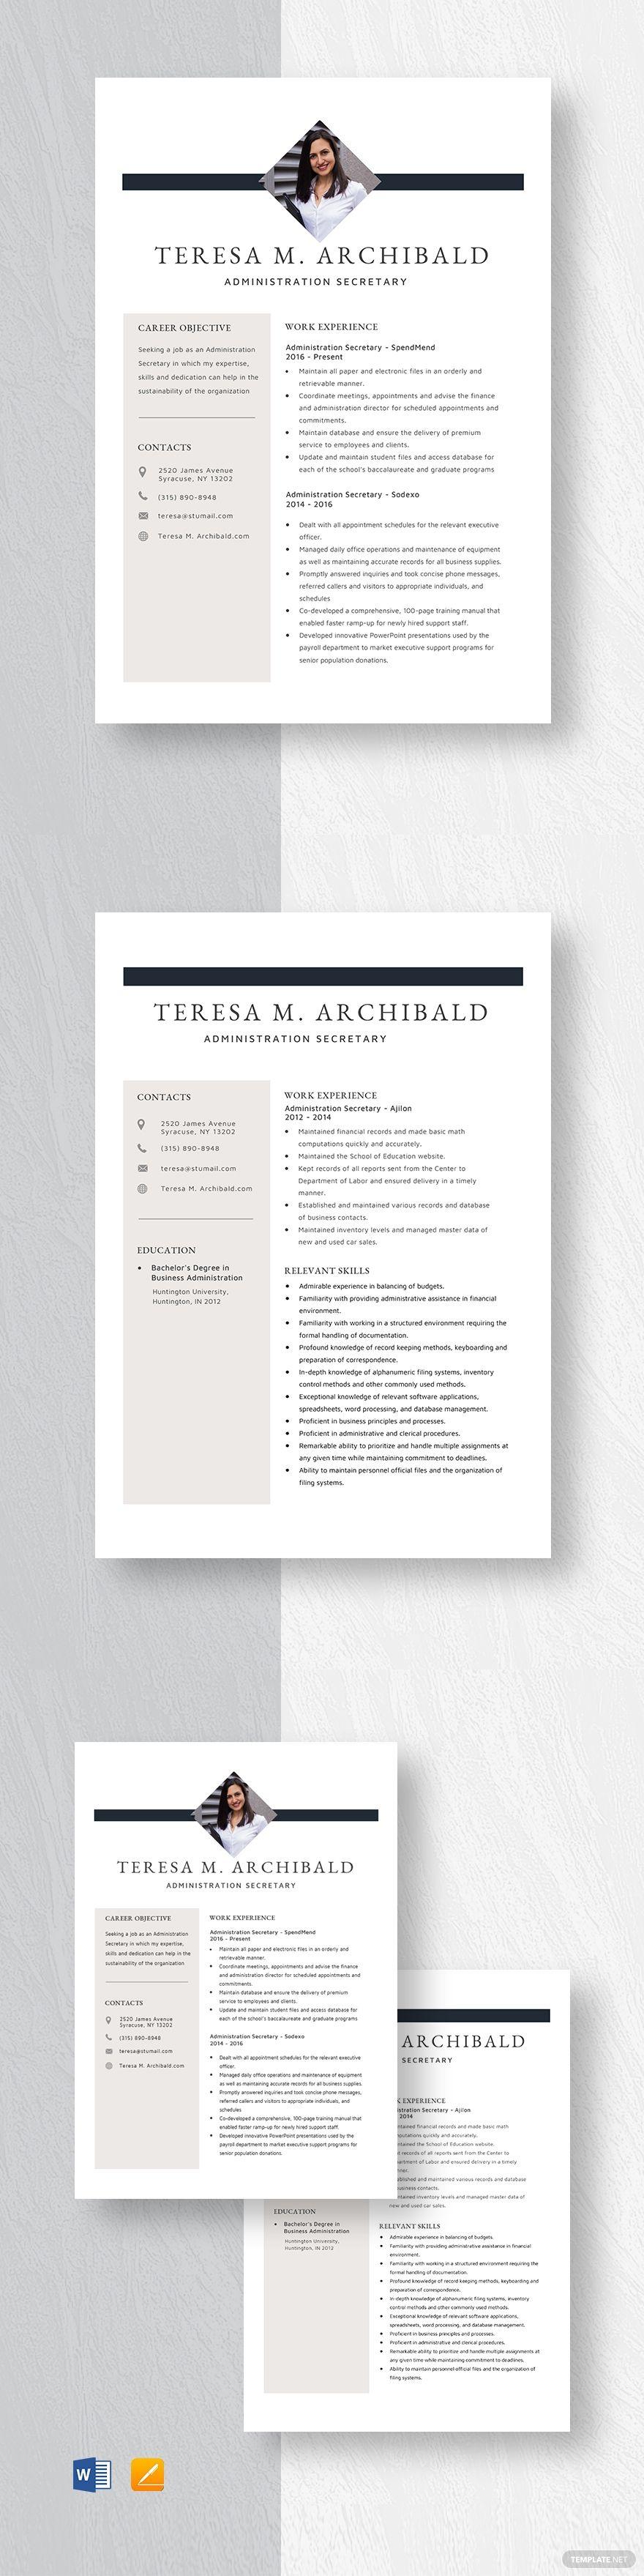 Administration secretary resume resume design template